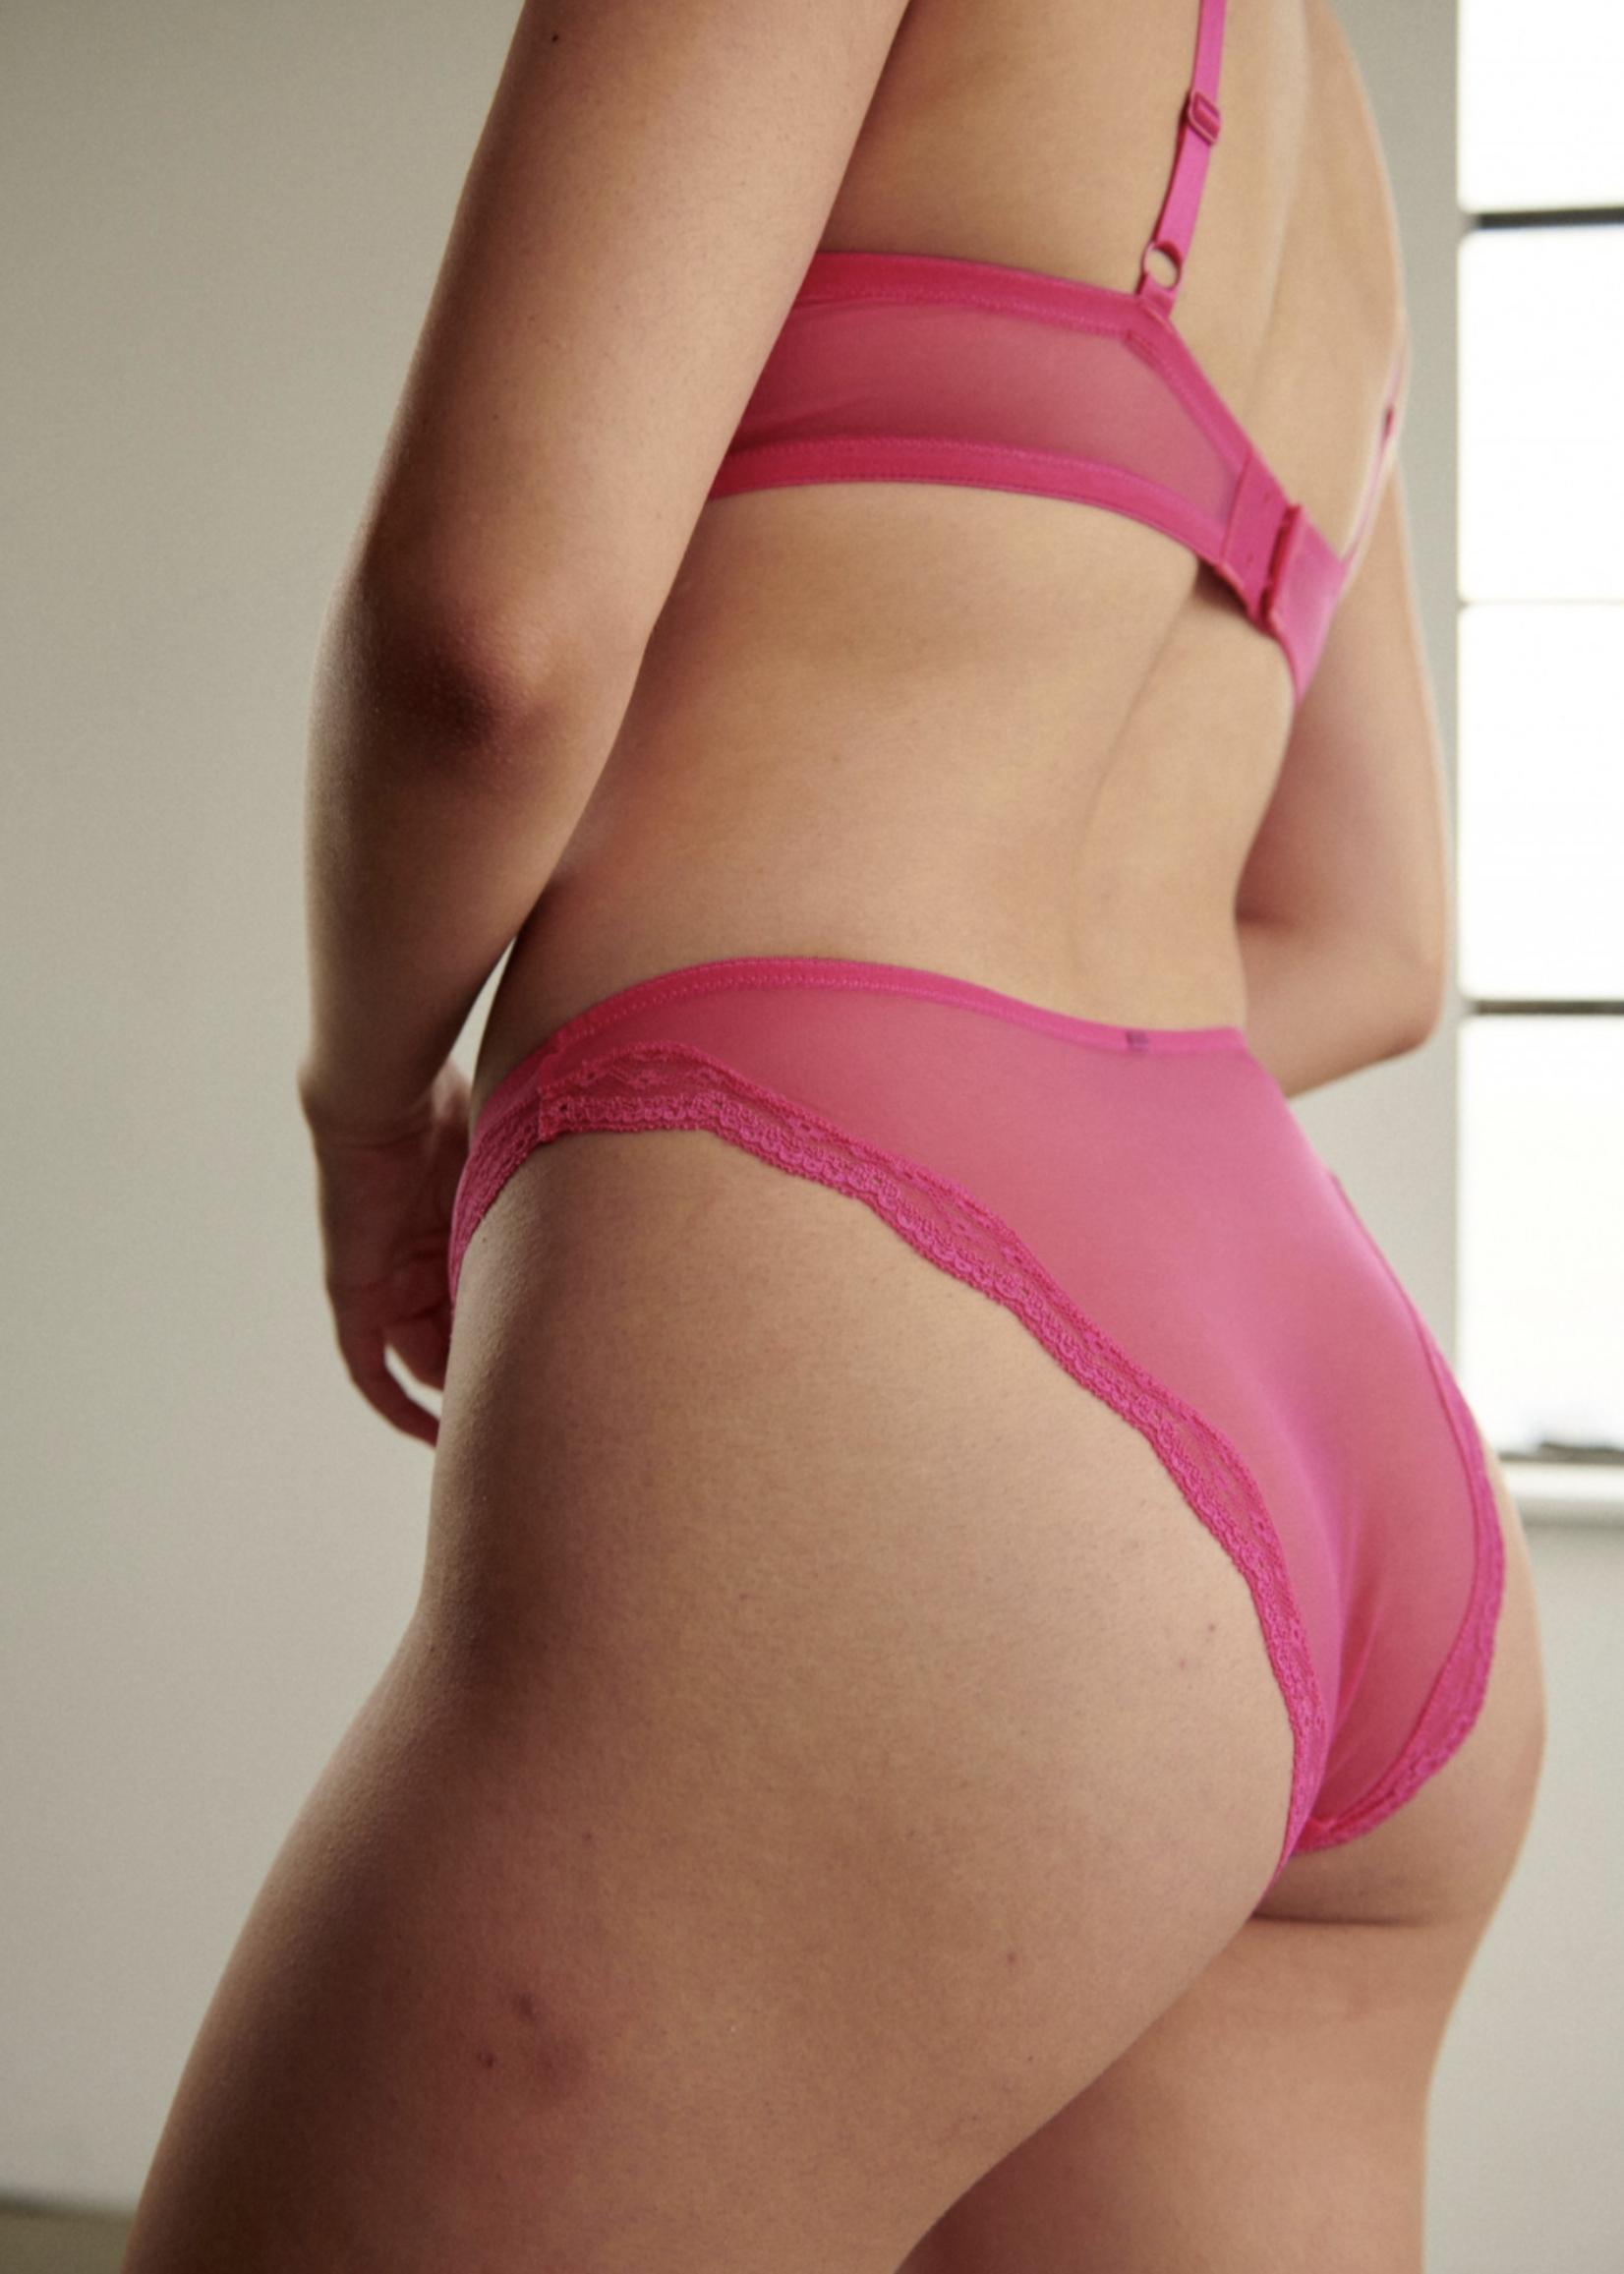 Blush Lingerie Lotus High Leg Bikini Hot Pink by Blush Lingerie